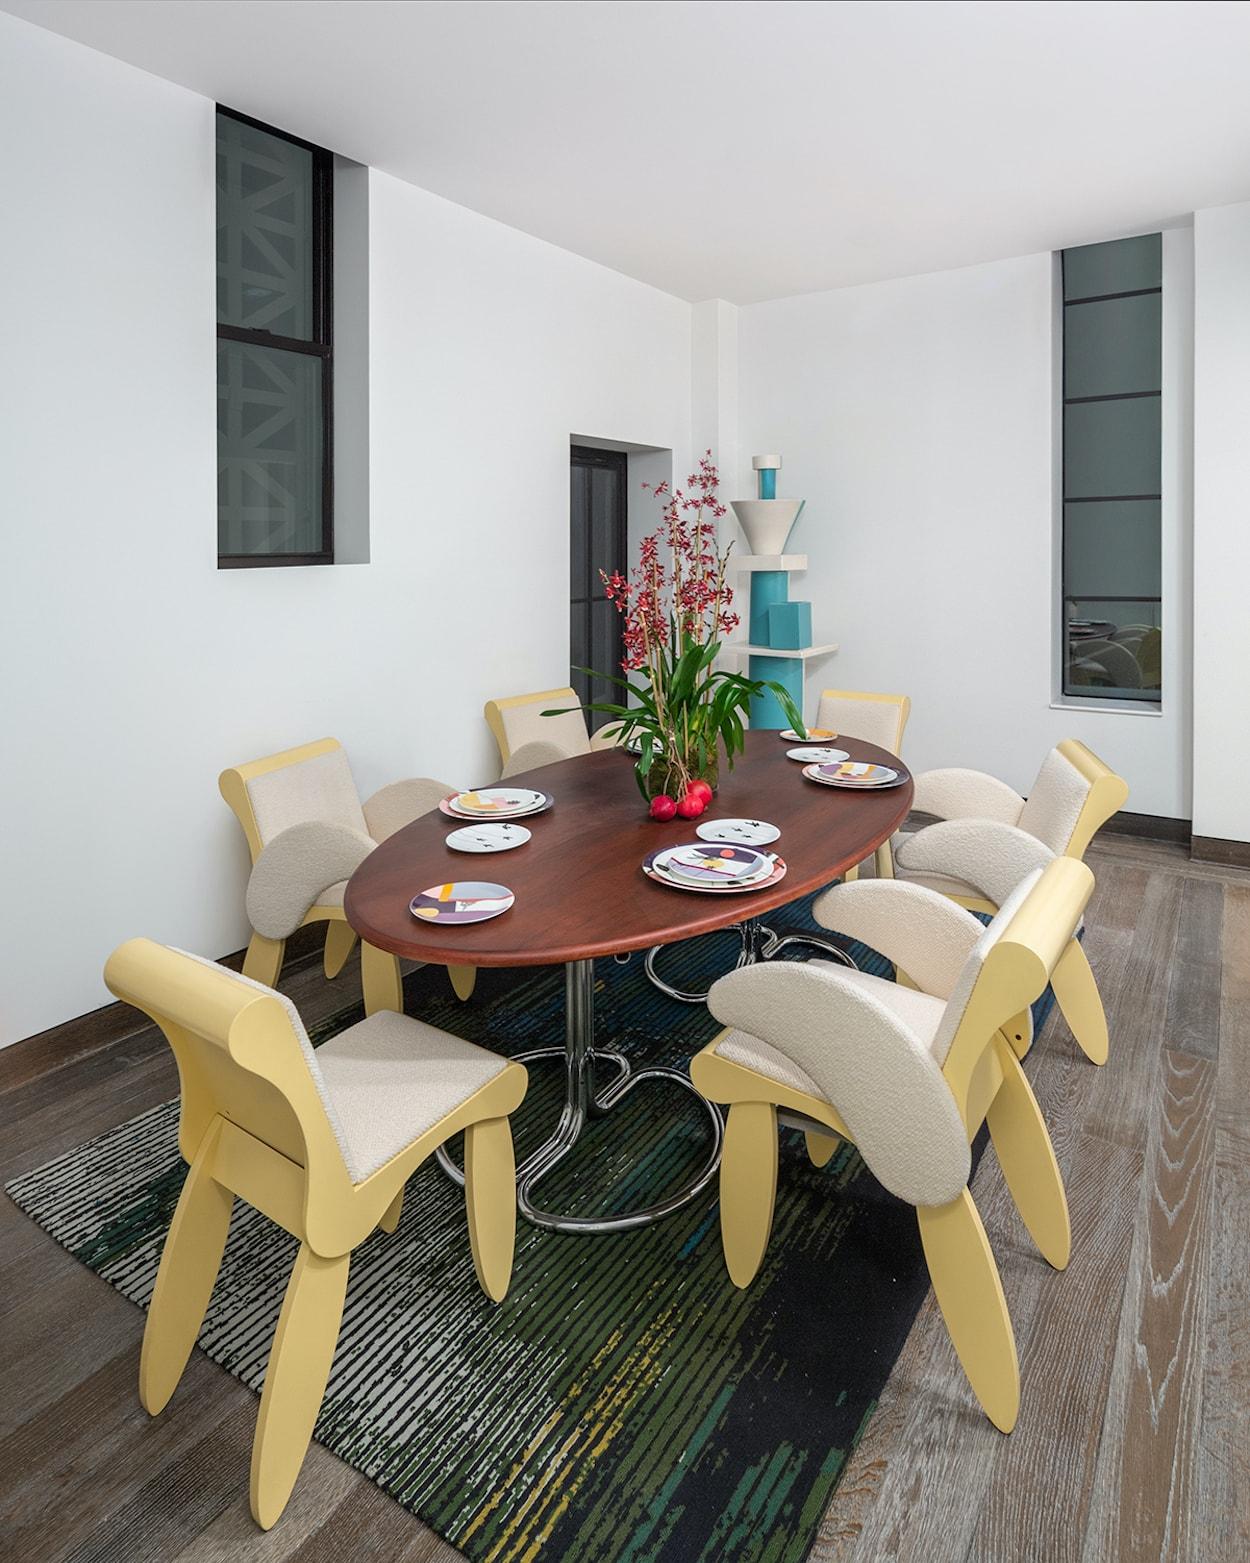 12_©_Robert_Granoff_111_W_57th_PH_Dining_Room_Table-min